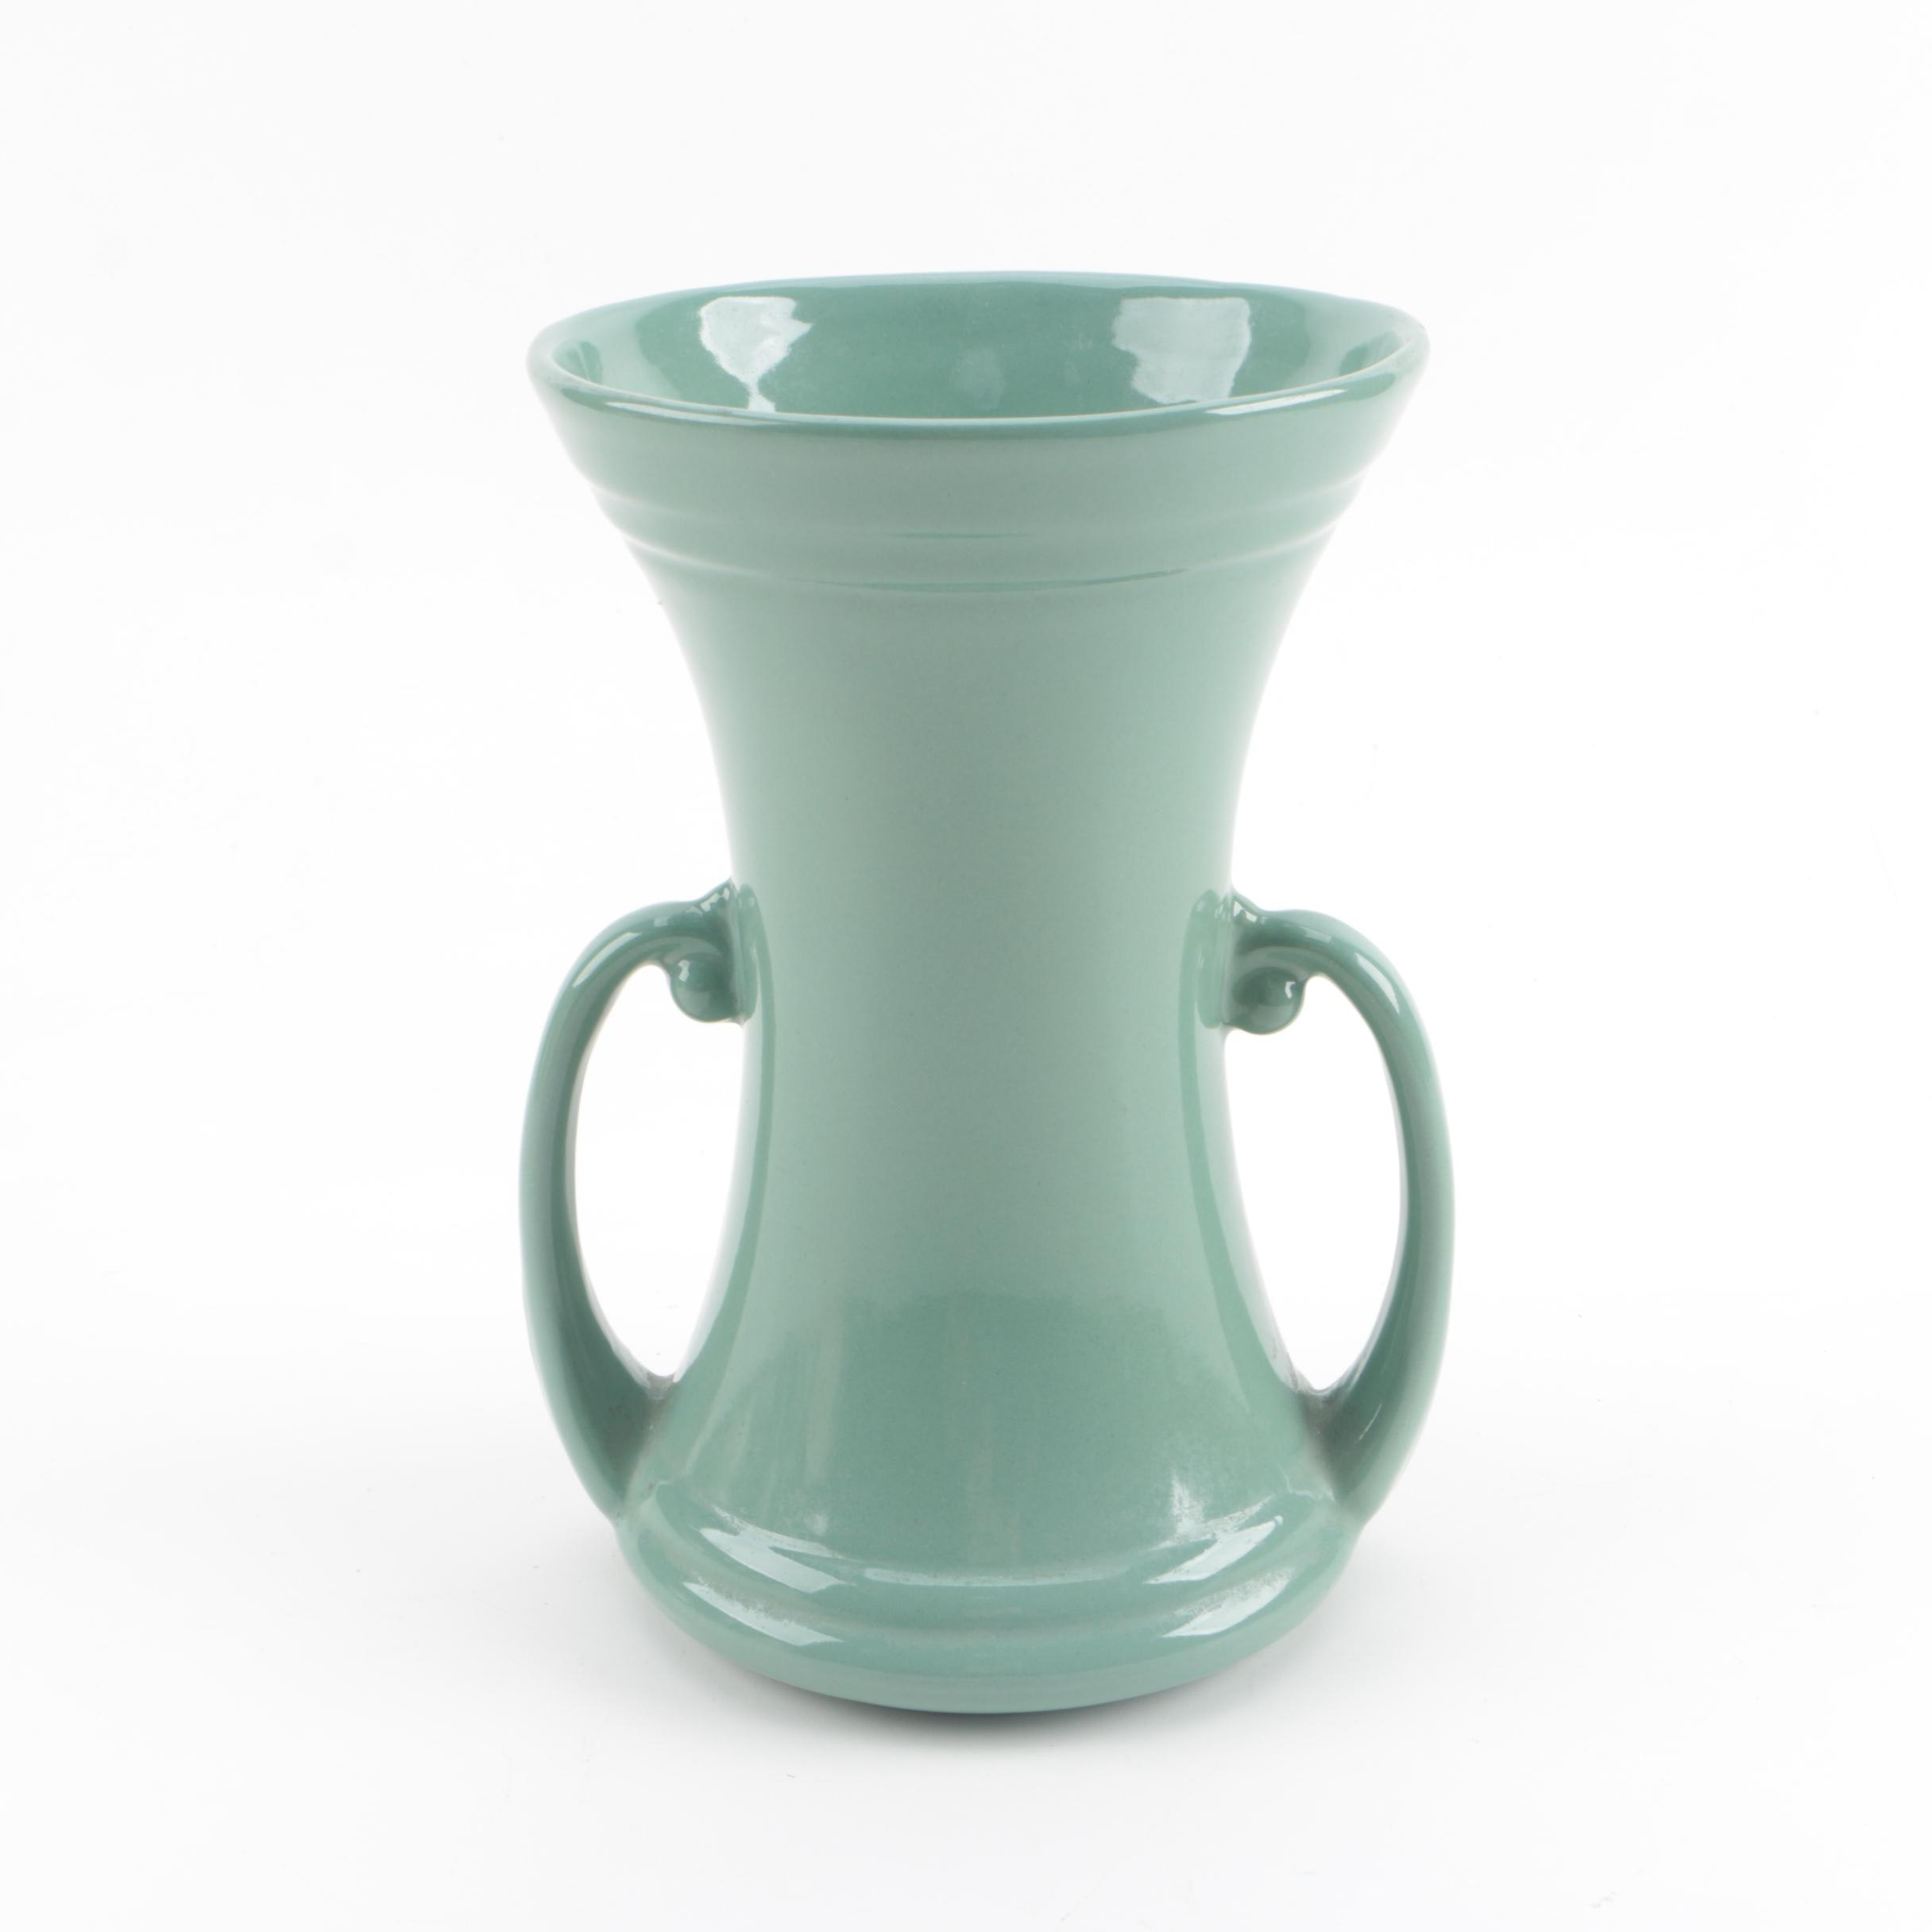 Circa 1940s Abingdon Pottery Green Ceramic Vase